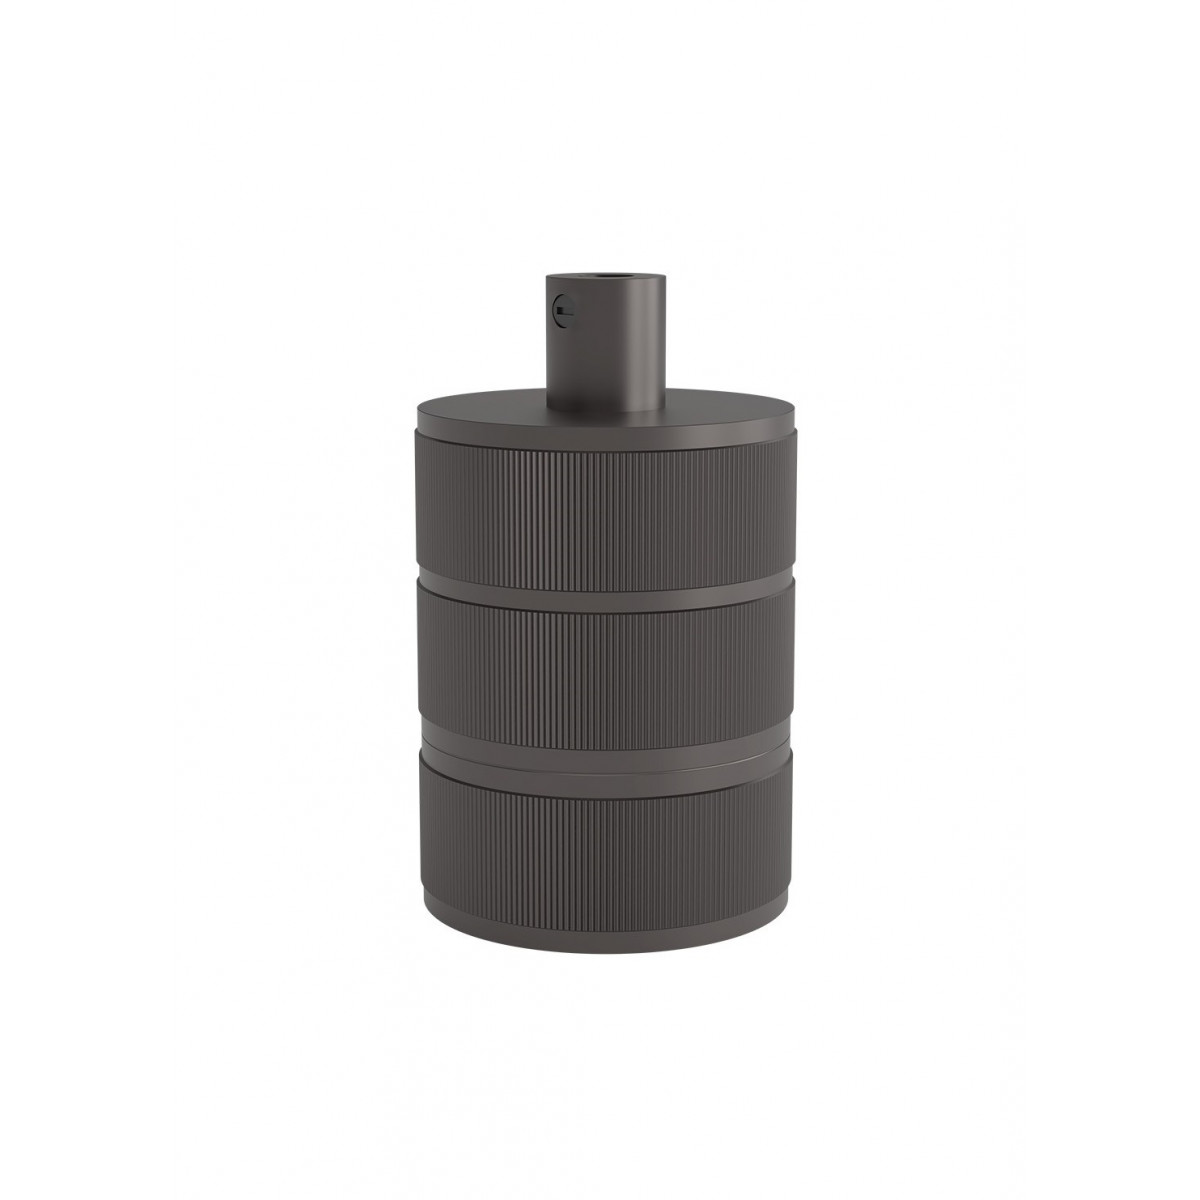 E27 Fassung perlmutt schwarz